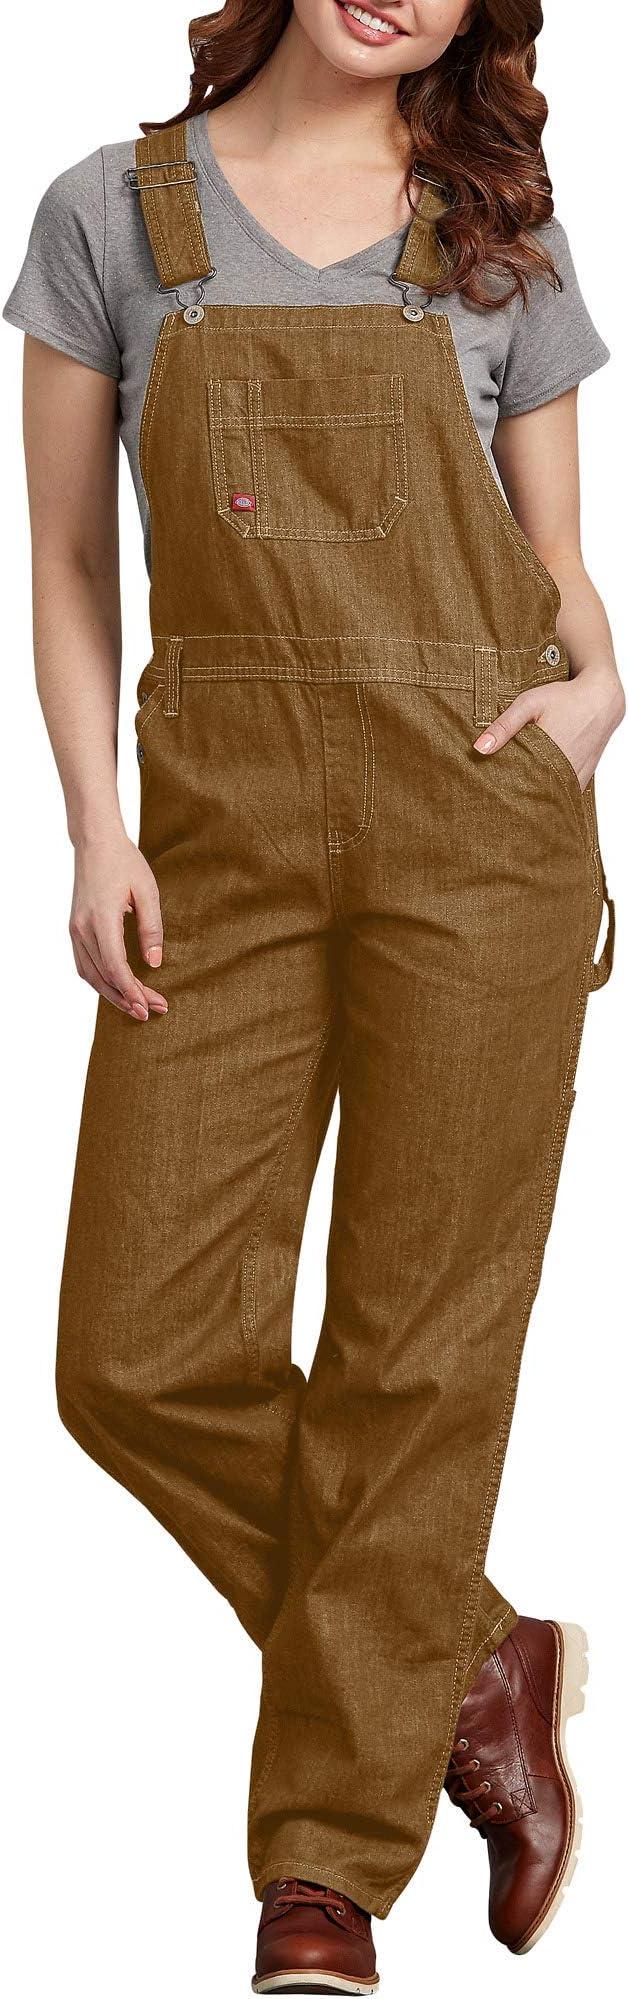 Vintage Overalls & Jumpsuits Dickies Womens Denim Bib Overall  AT vintagedancer.com